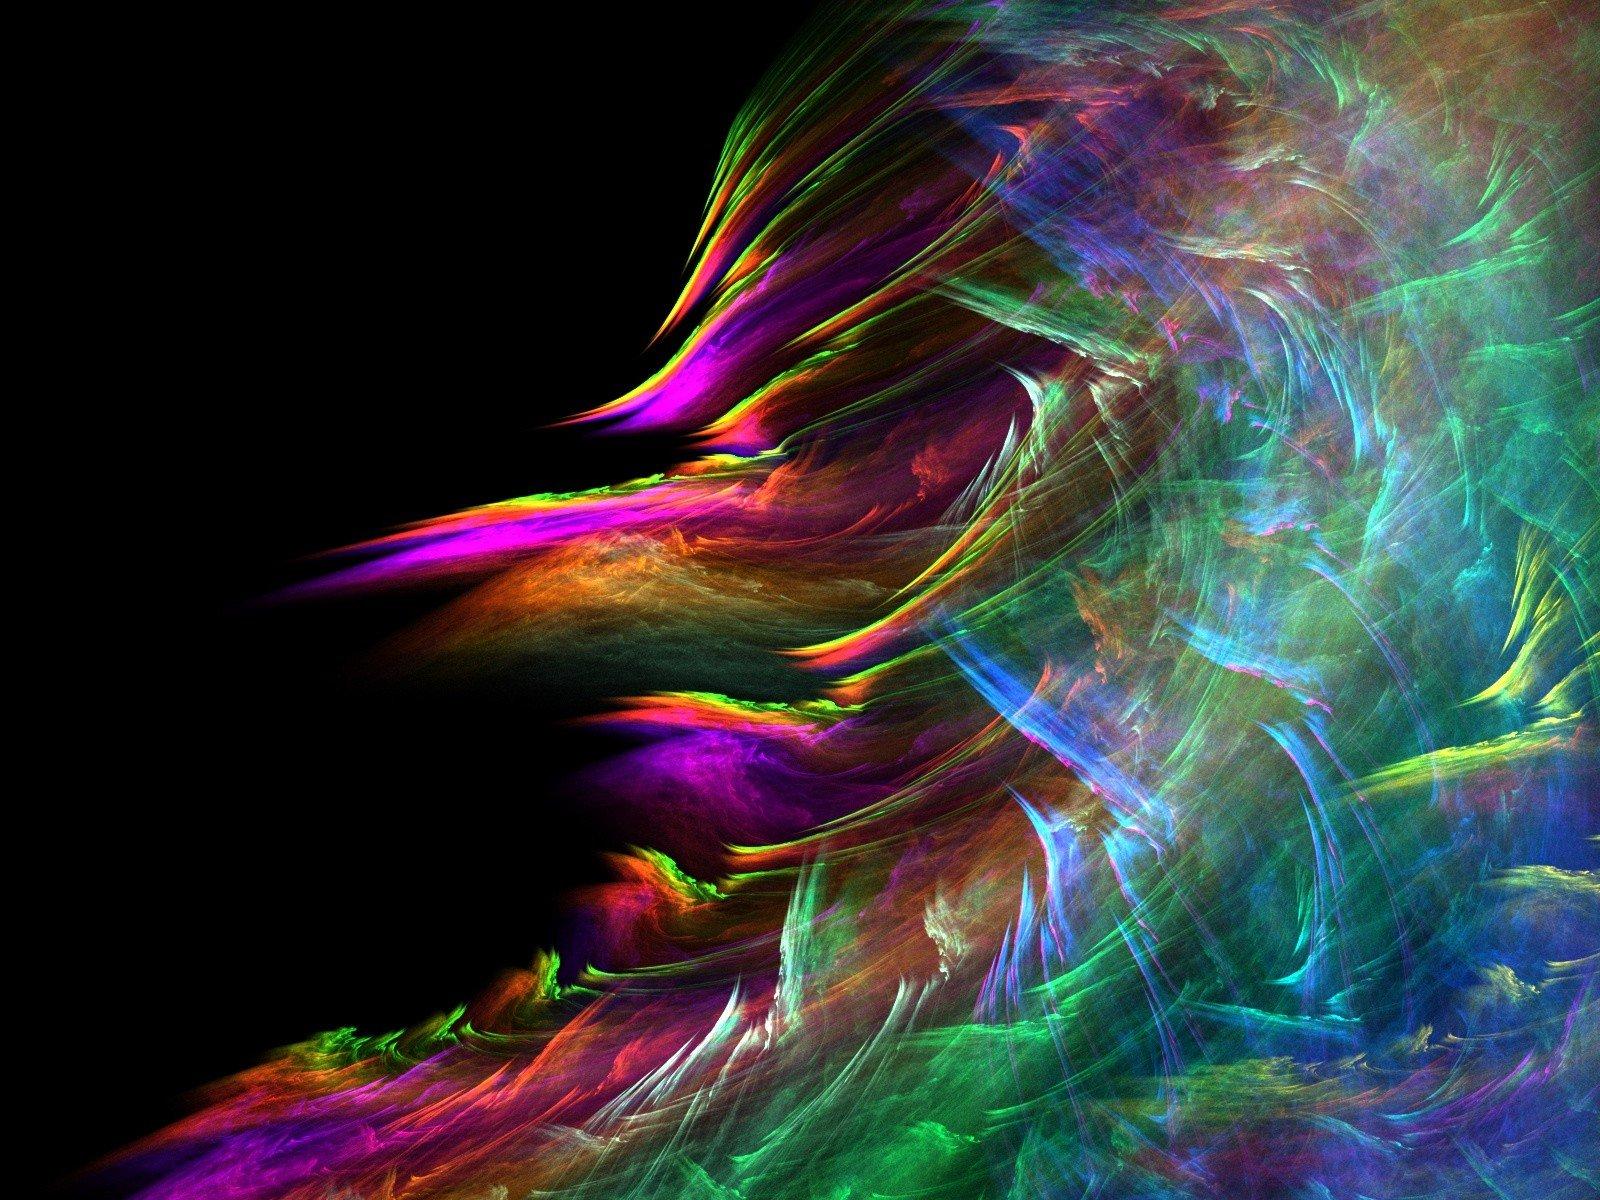 trippy galaxy wallpaper - photo #16